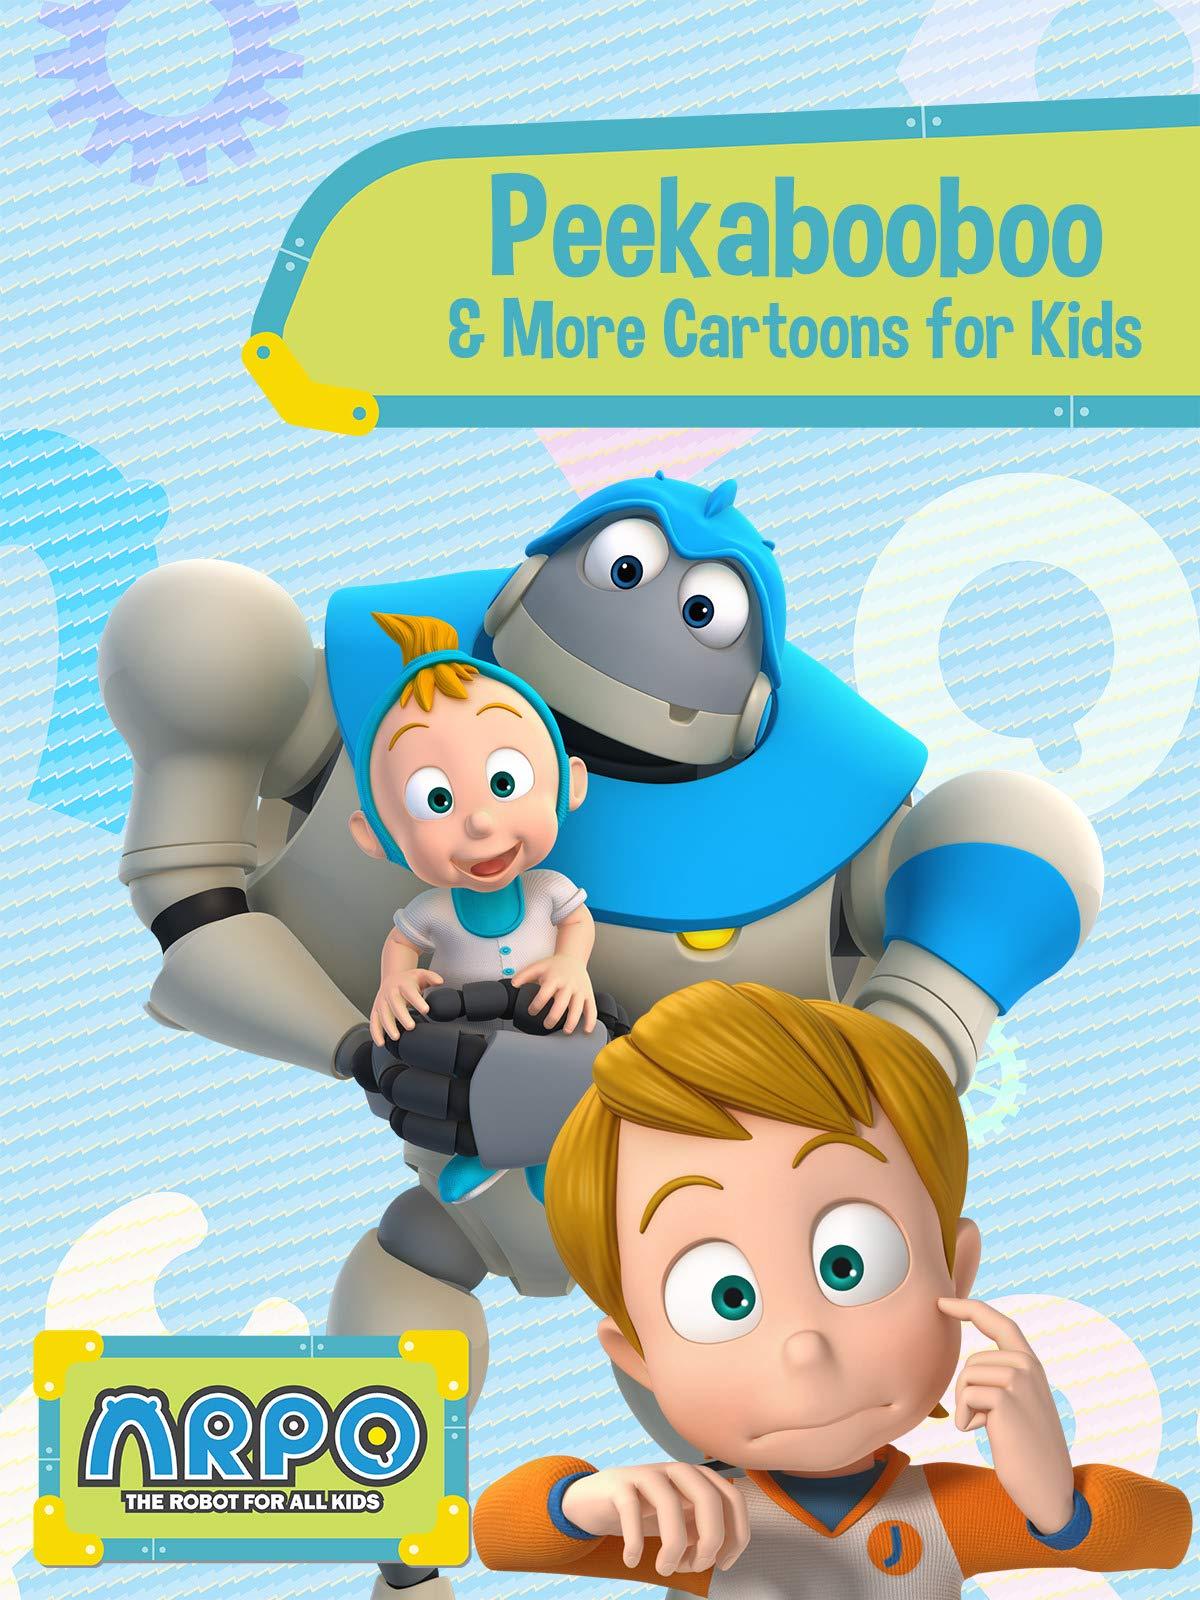 Arpo the Robot for All Kids - Peekabooboo & More Cartoons for Kids